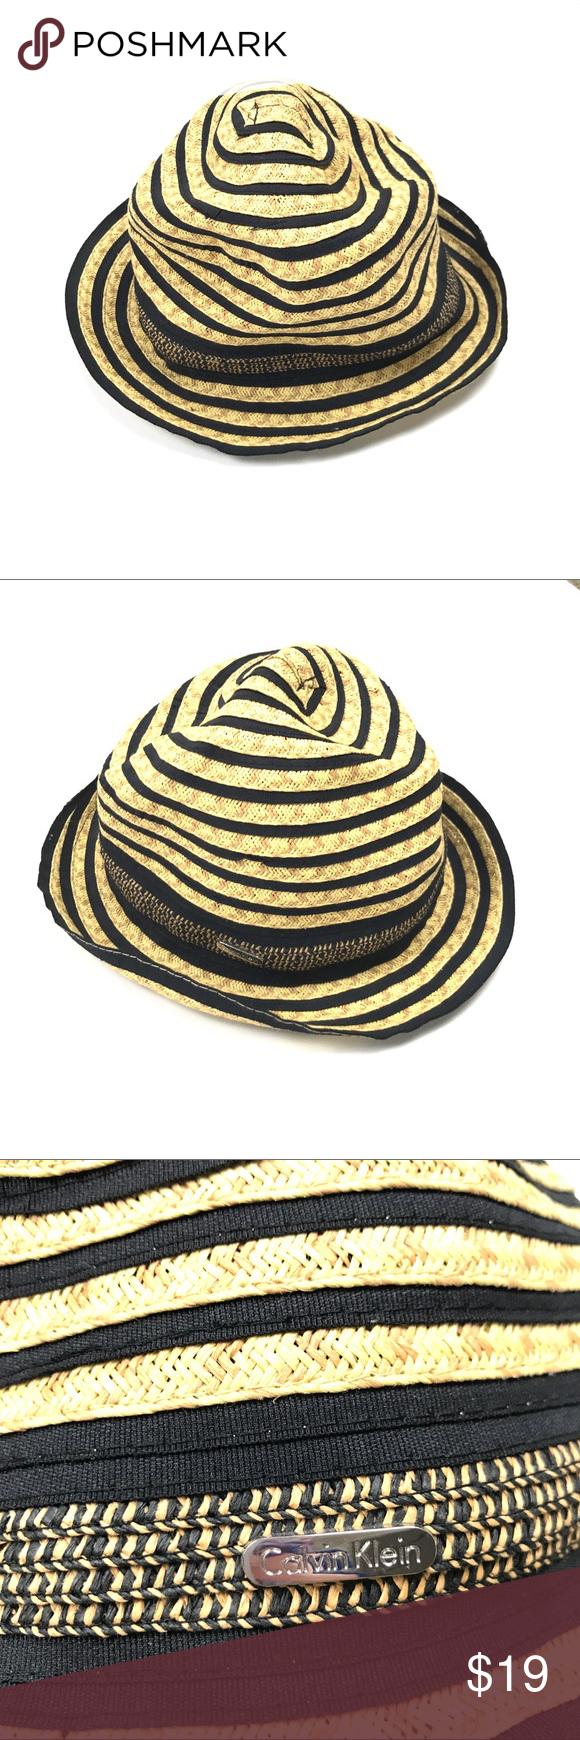 Calvin Klein Straw Hat Tan Black Striped Fedora Calvin Klein Straw Fedora Hat    One Size Unisex  Condition: Excellent pre-owned condition. Calvin Klein Accessories Hats